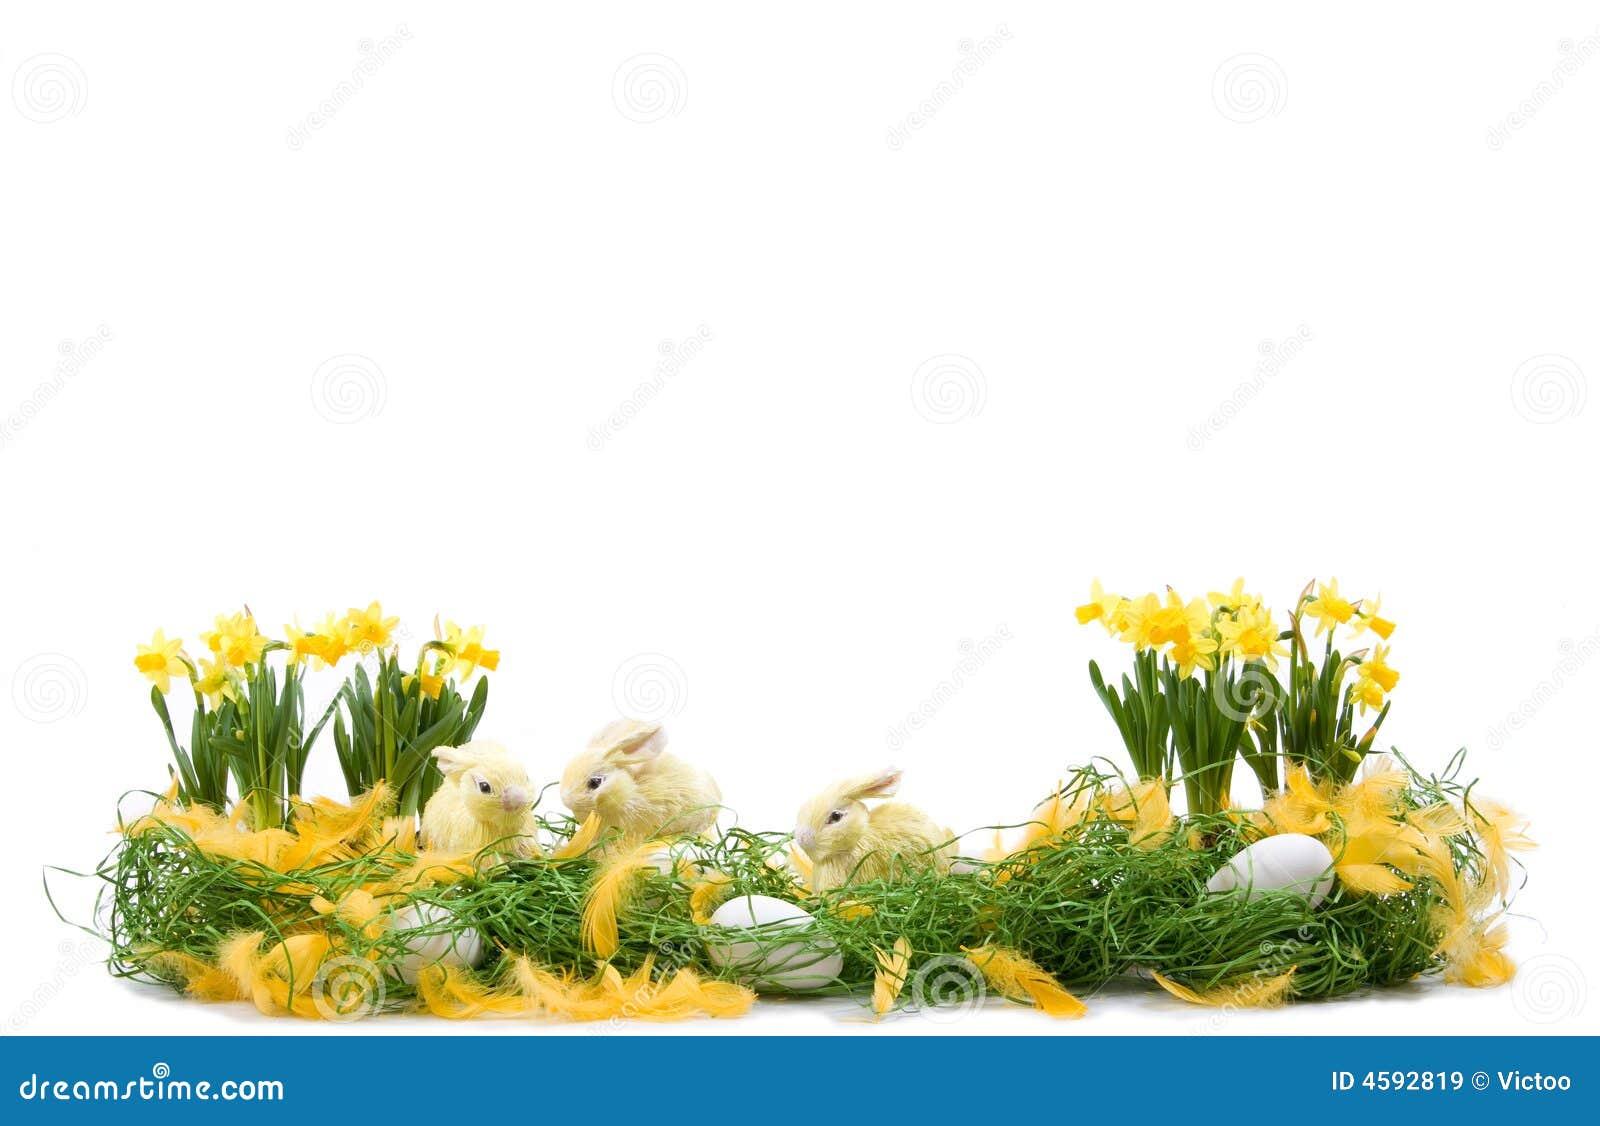 Ostern dekoration lizenzfreie stockbilder bild 4592819 for Ostern dekoration